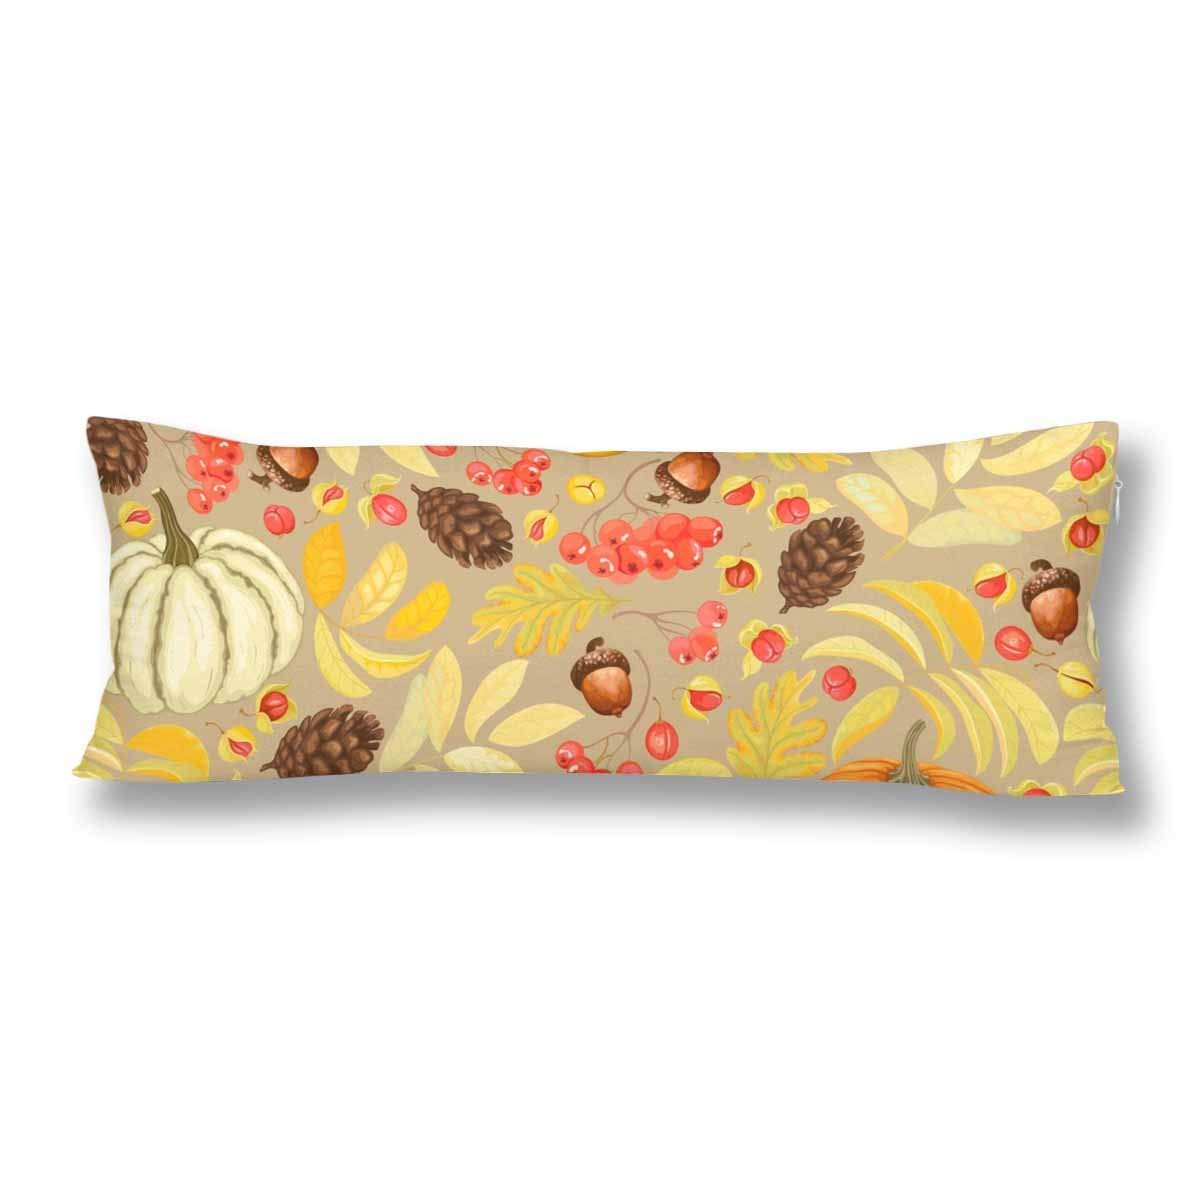 ABPHOTO Autumn Fall Harvest Pumpkin Acorns Body Pillow Covers Pillowcase 20x60 inch Pine Cones Rowan Body Pillow Case Protector